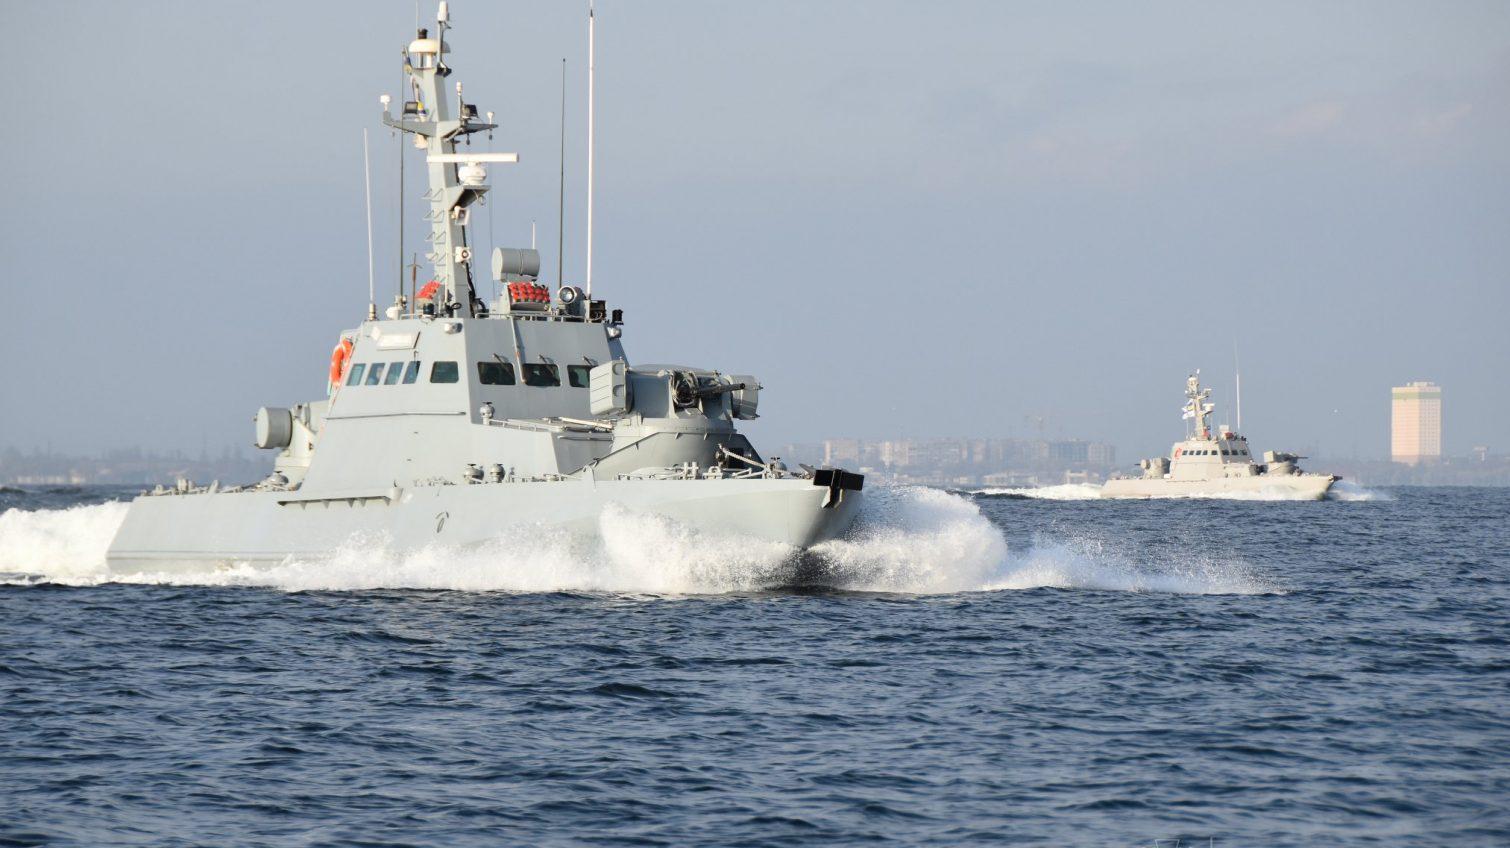 В Одессе прошли учения украинского флота по стандартам НАТО (фото) «фото»